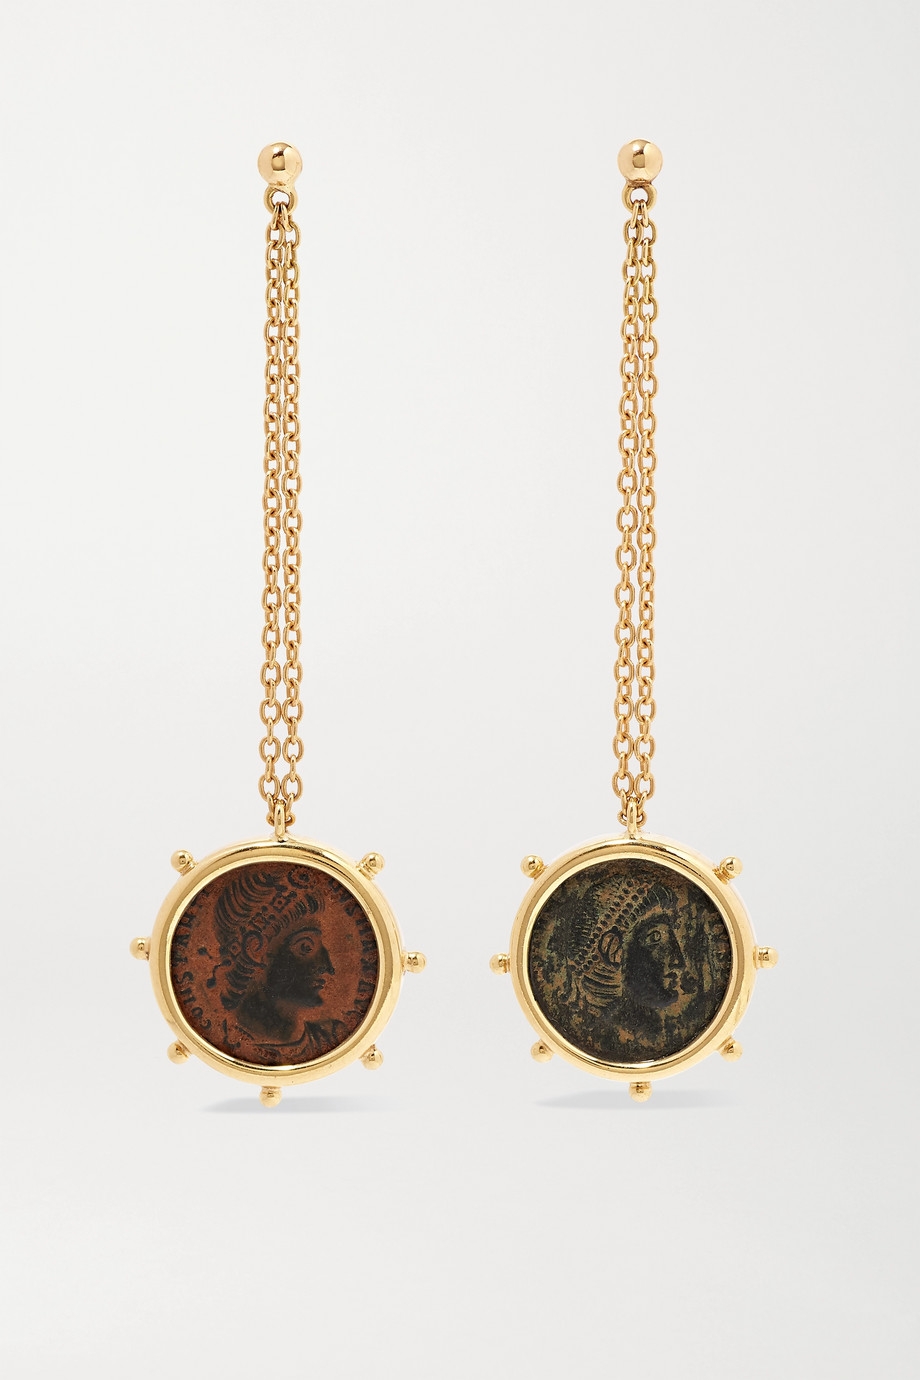 Dubini Constantine 18-karat gold and bronze earrings